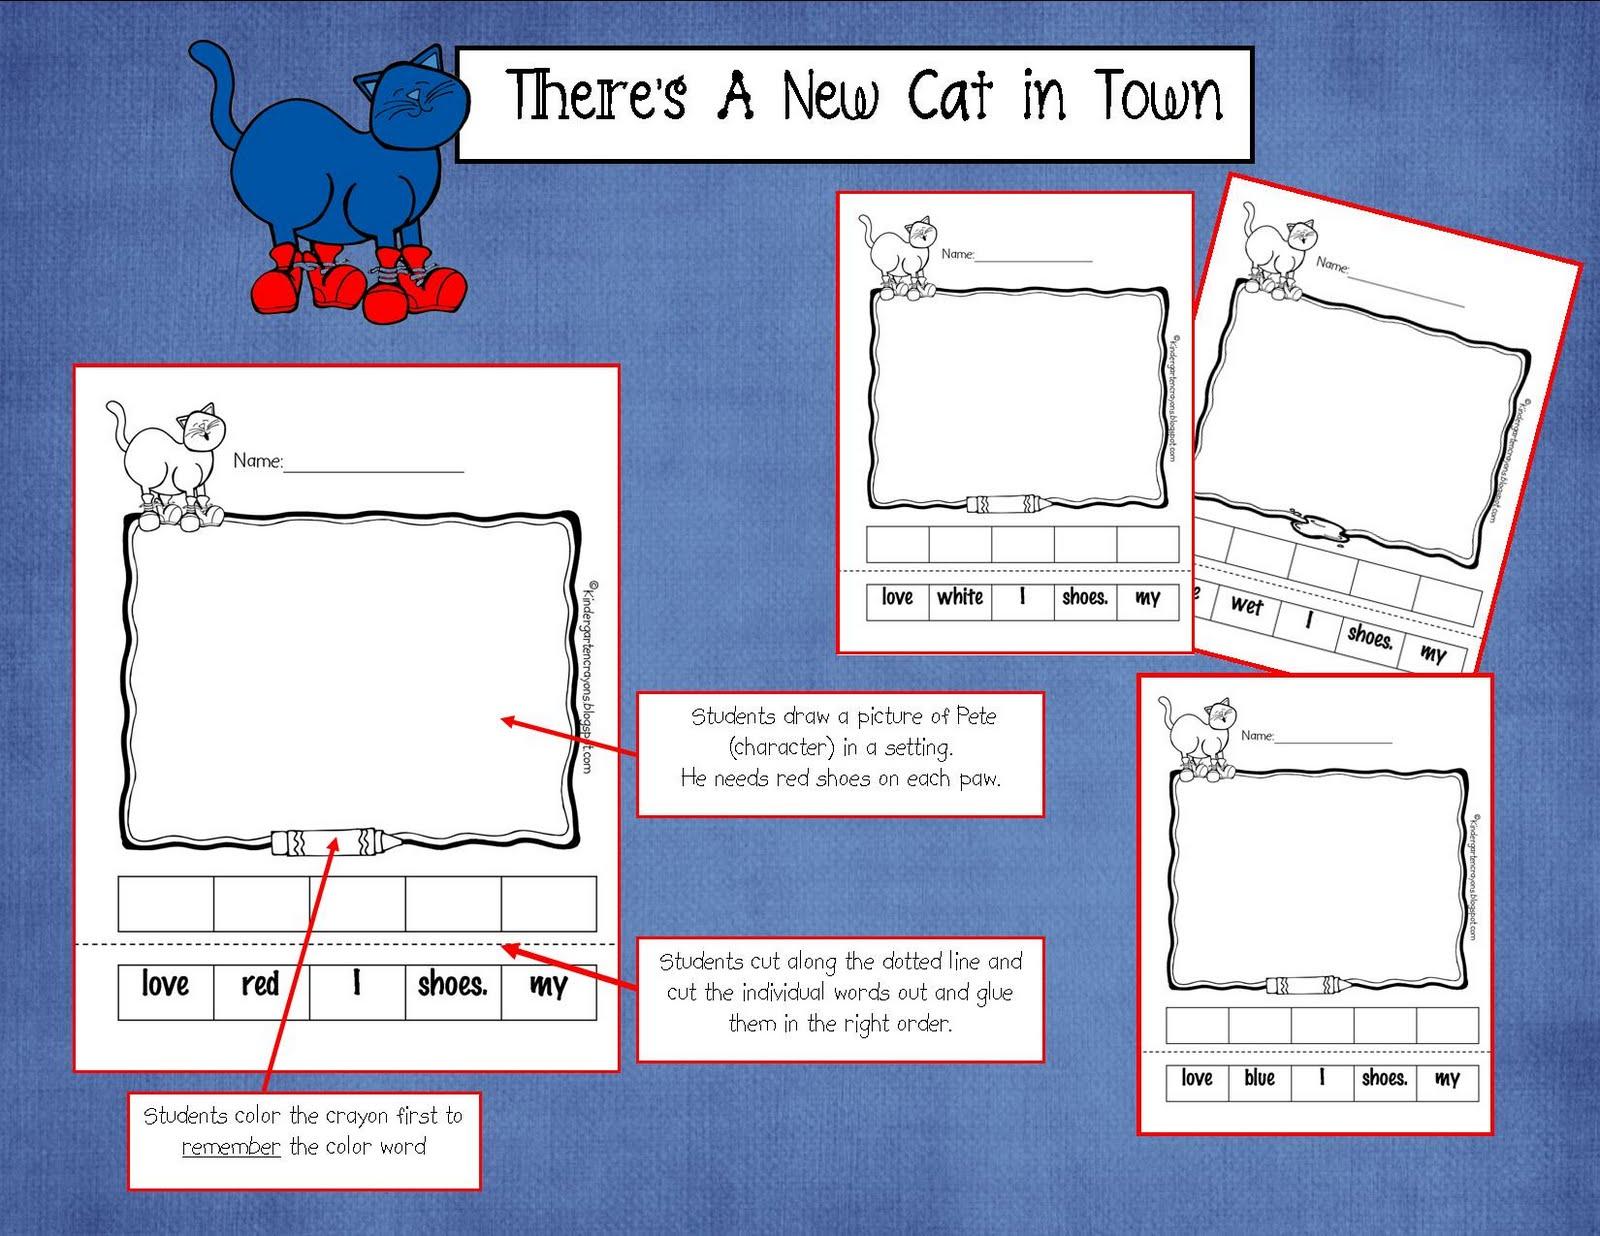 Kindergarten Crayons More From The New Cat In Town Meet Pete